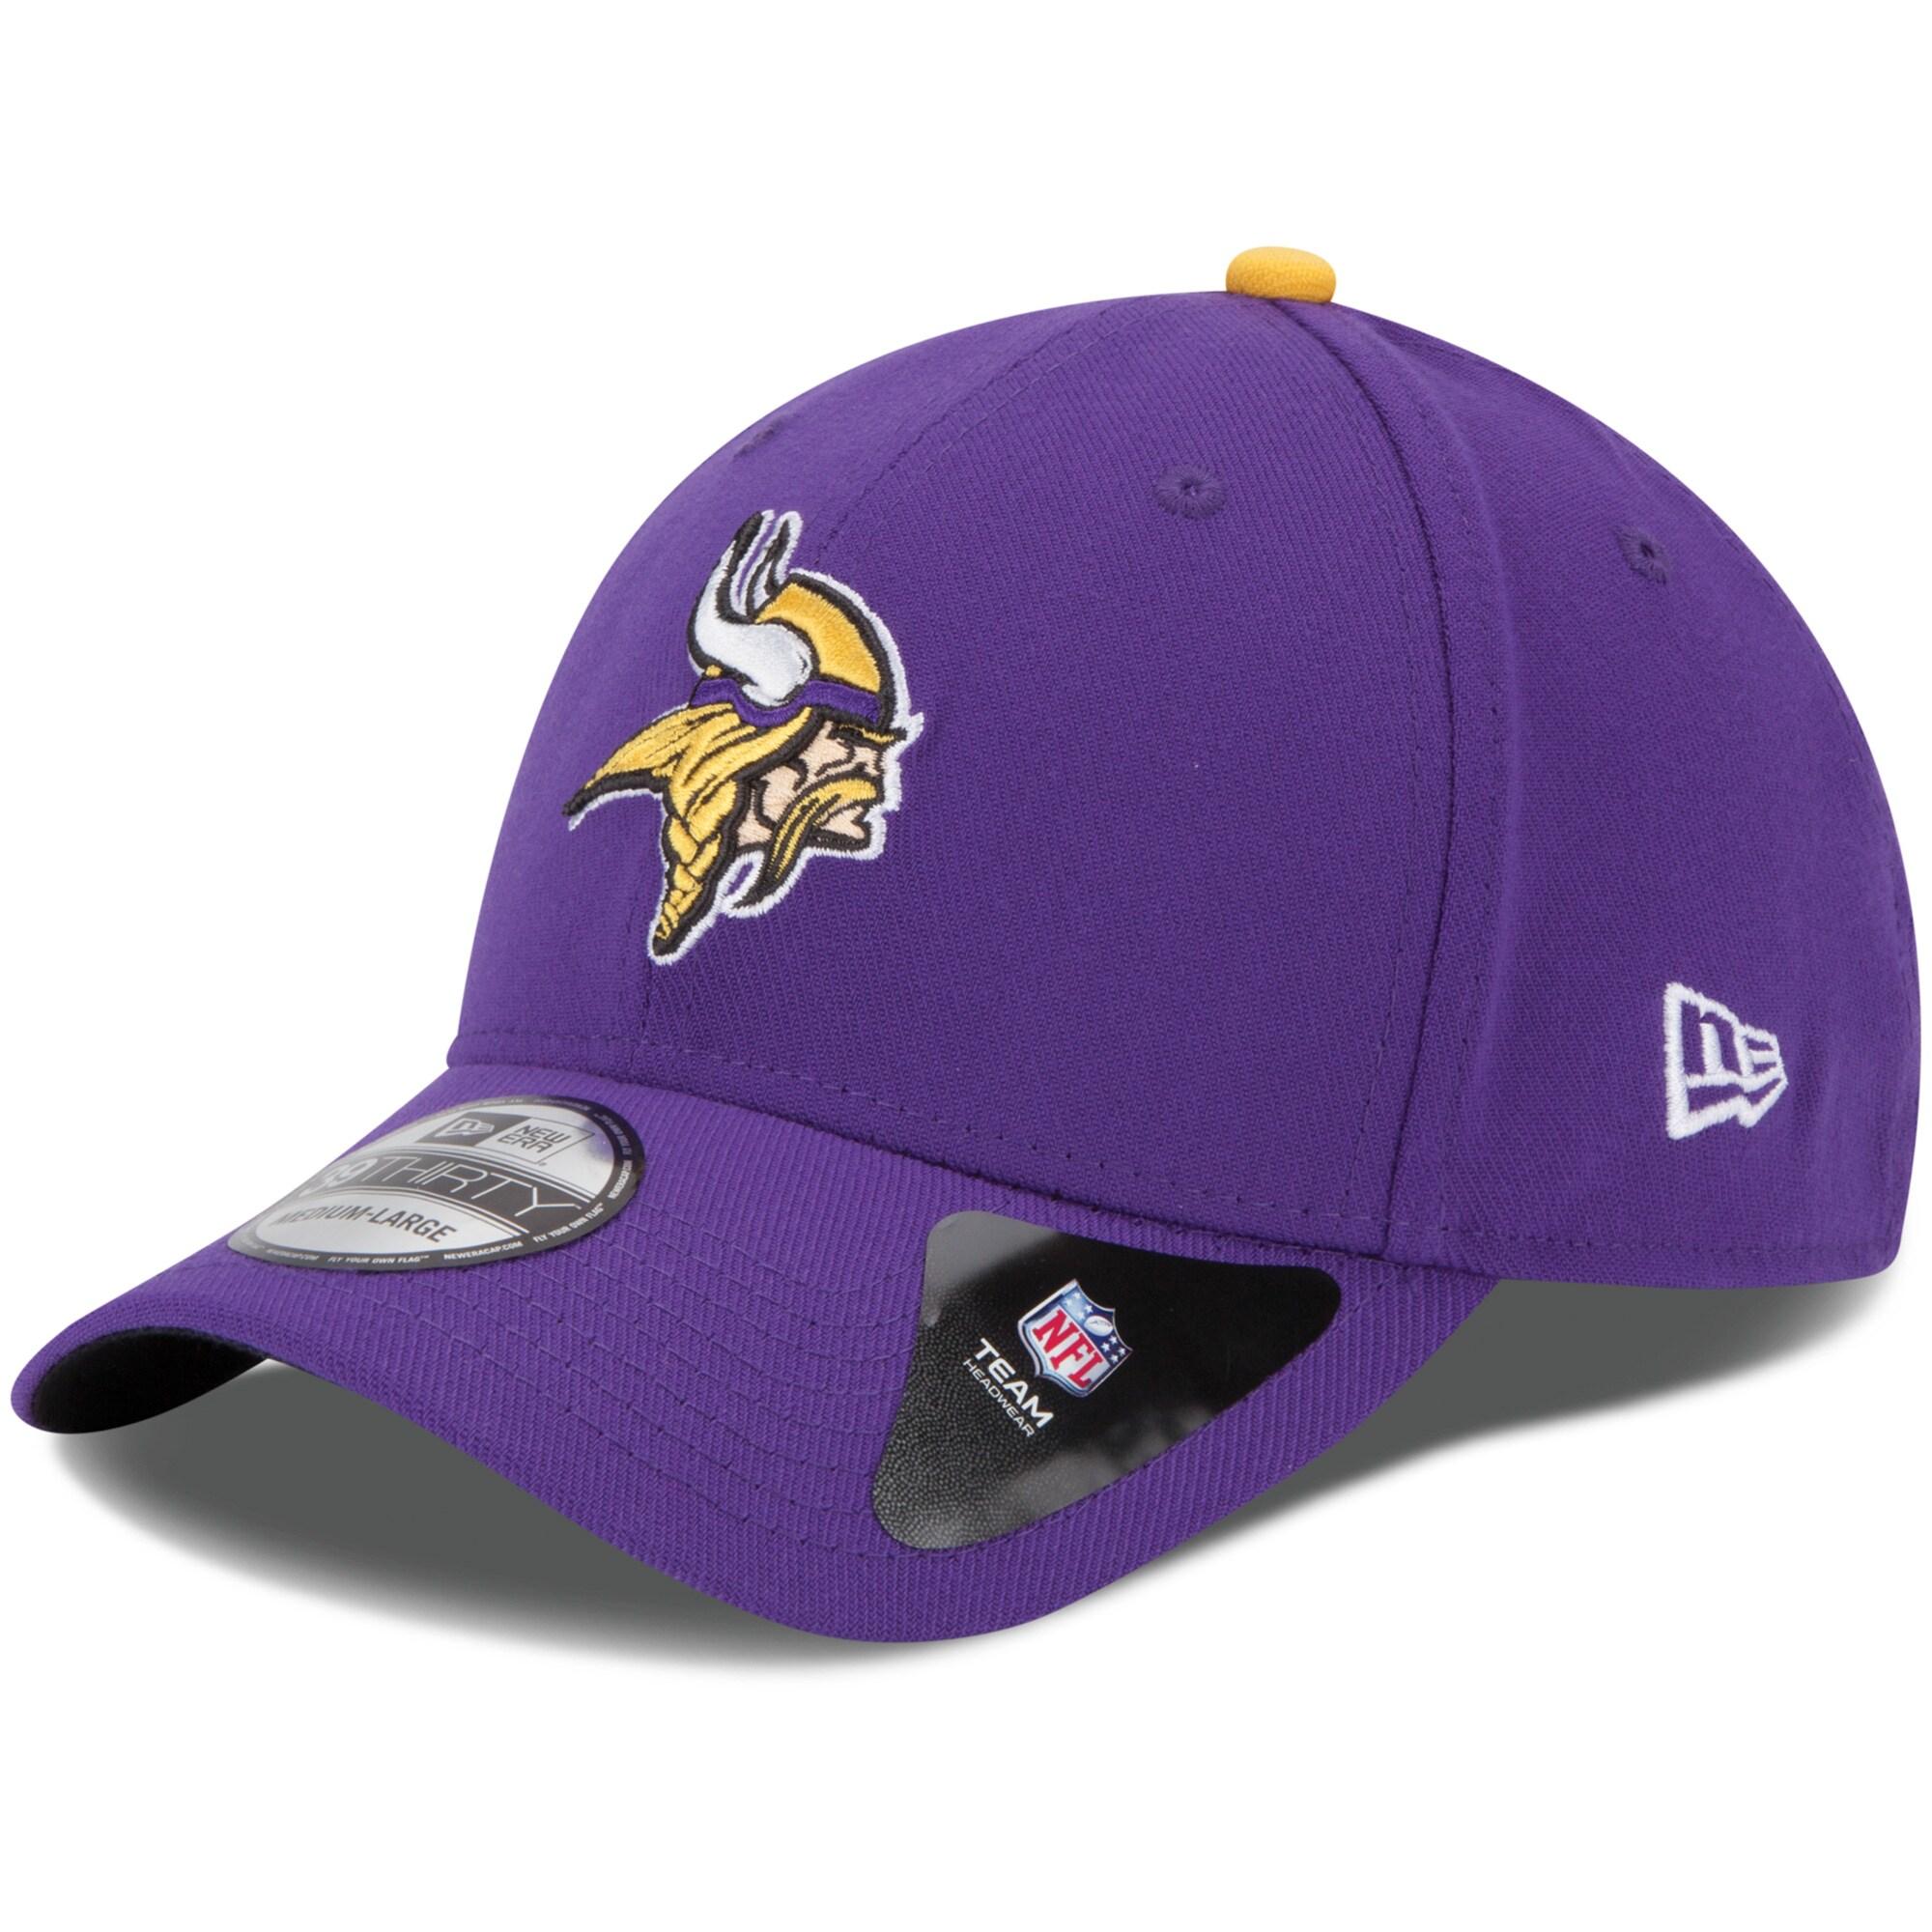 Minnesota Vikings New Era Youth Team Classic 39THIRTY Flex Hat - Purple